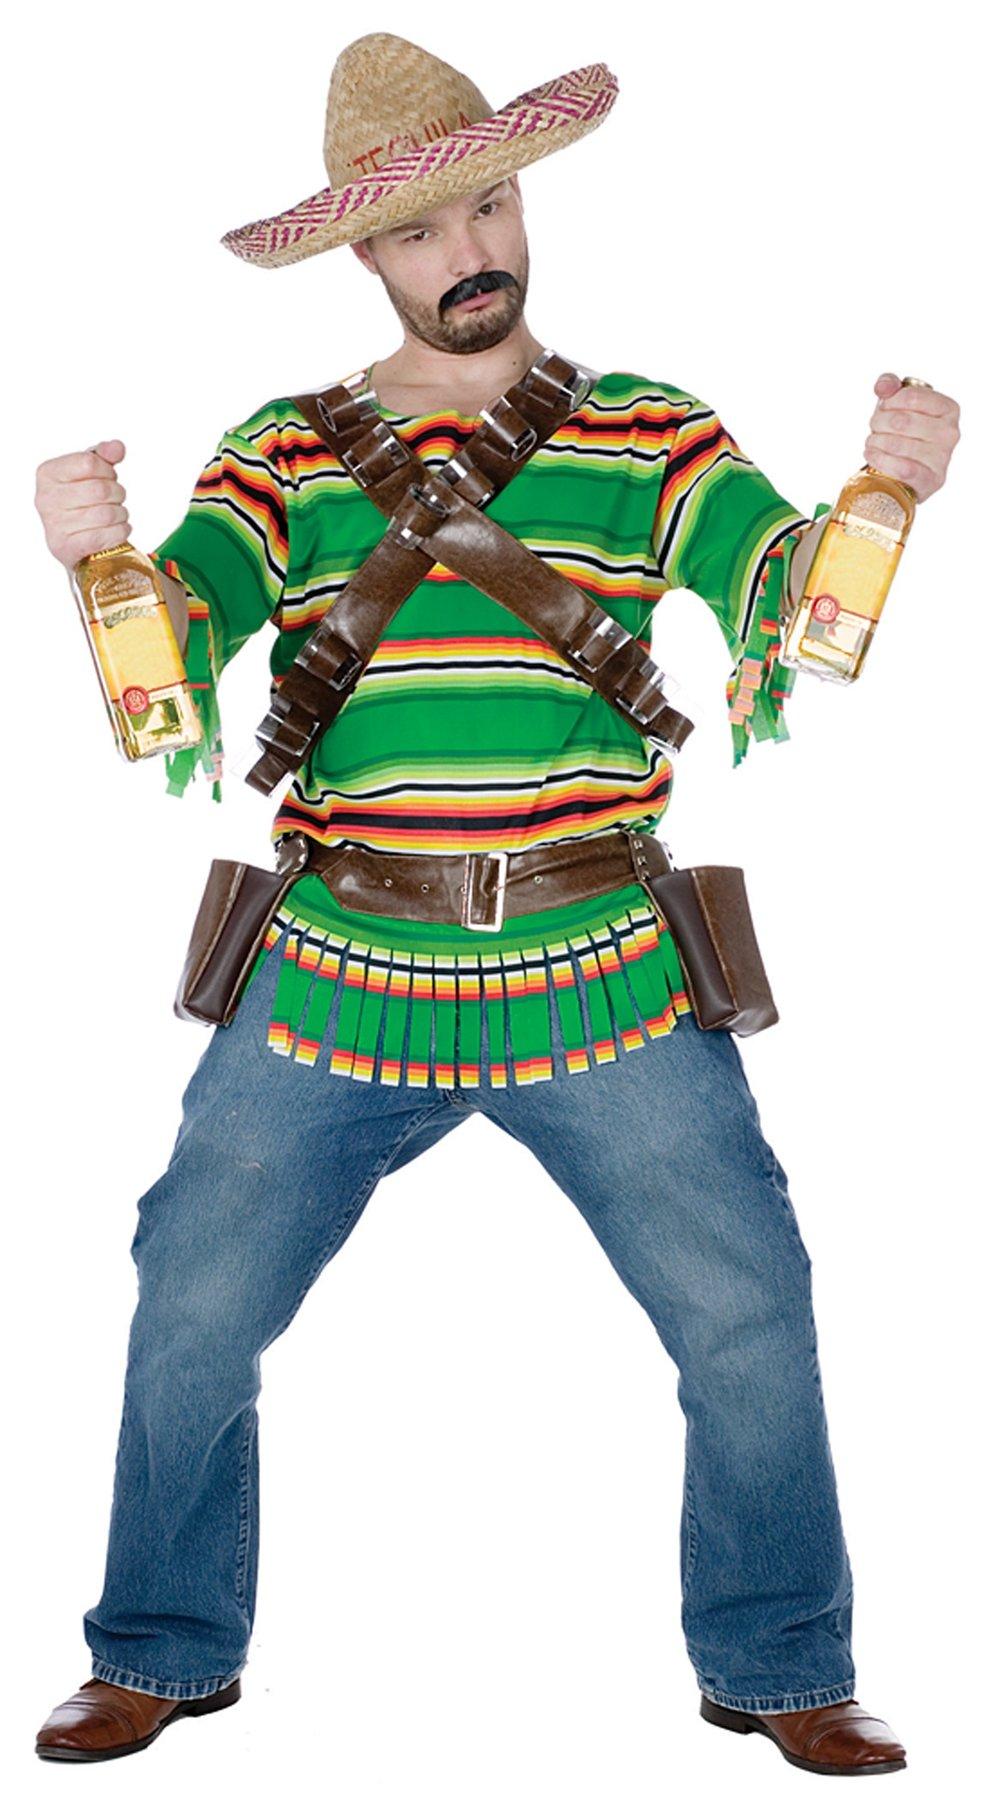 tequila costume.jpg